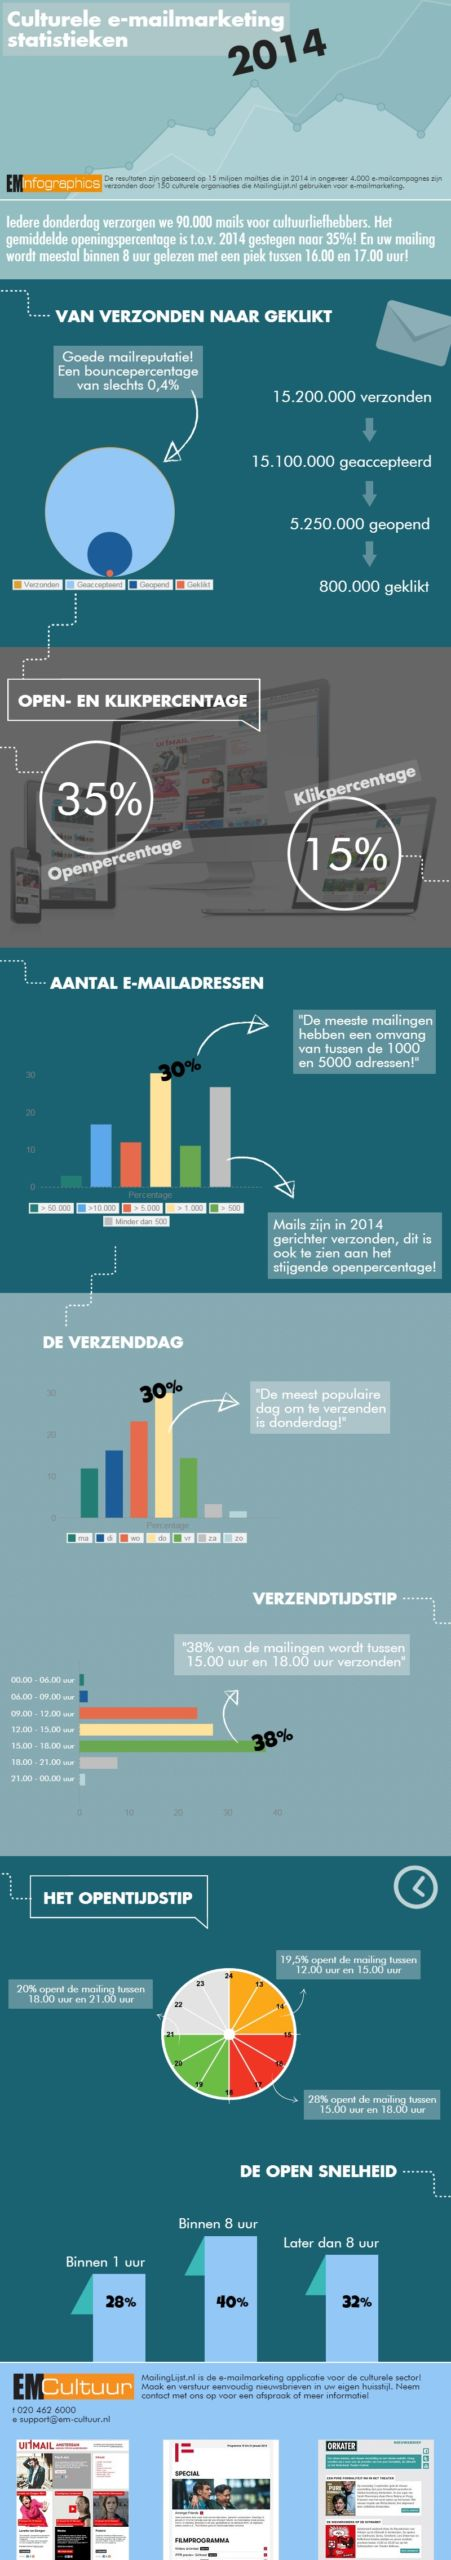 Infographic E-mailmarketing-2014